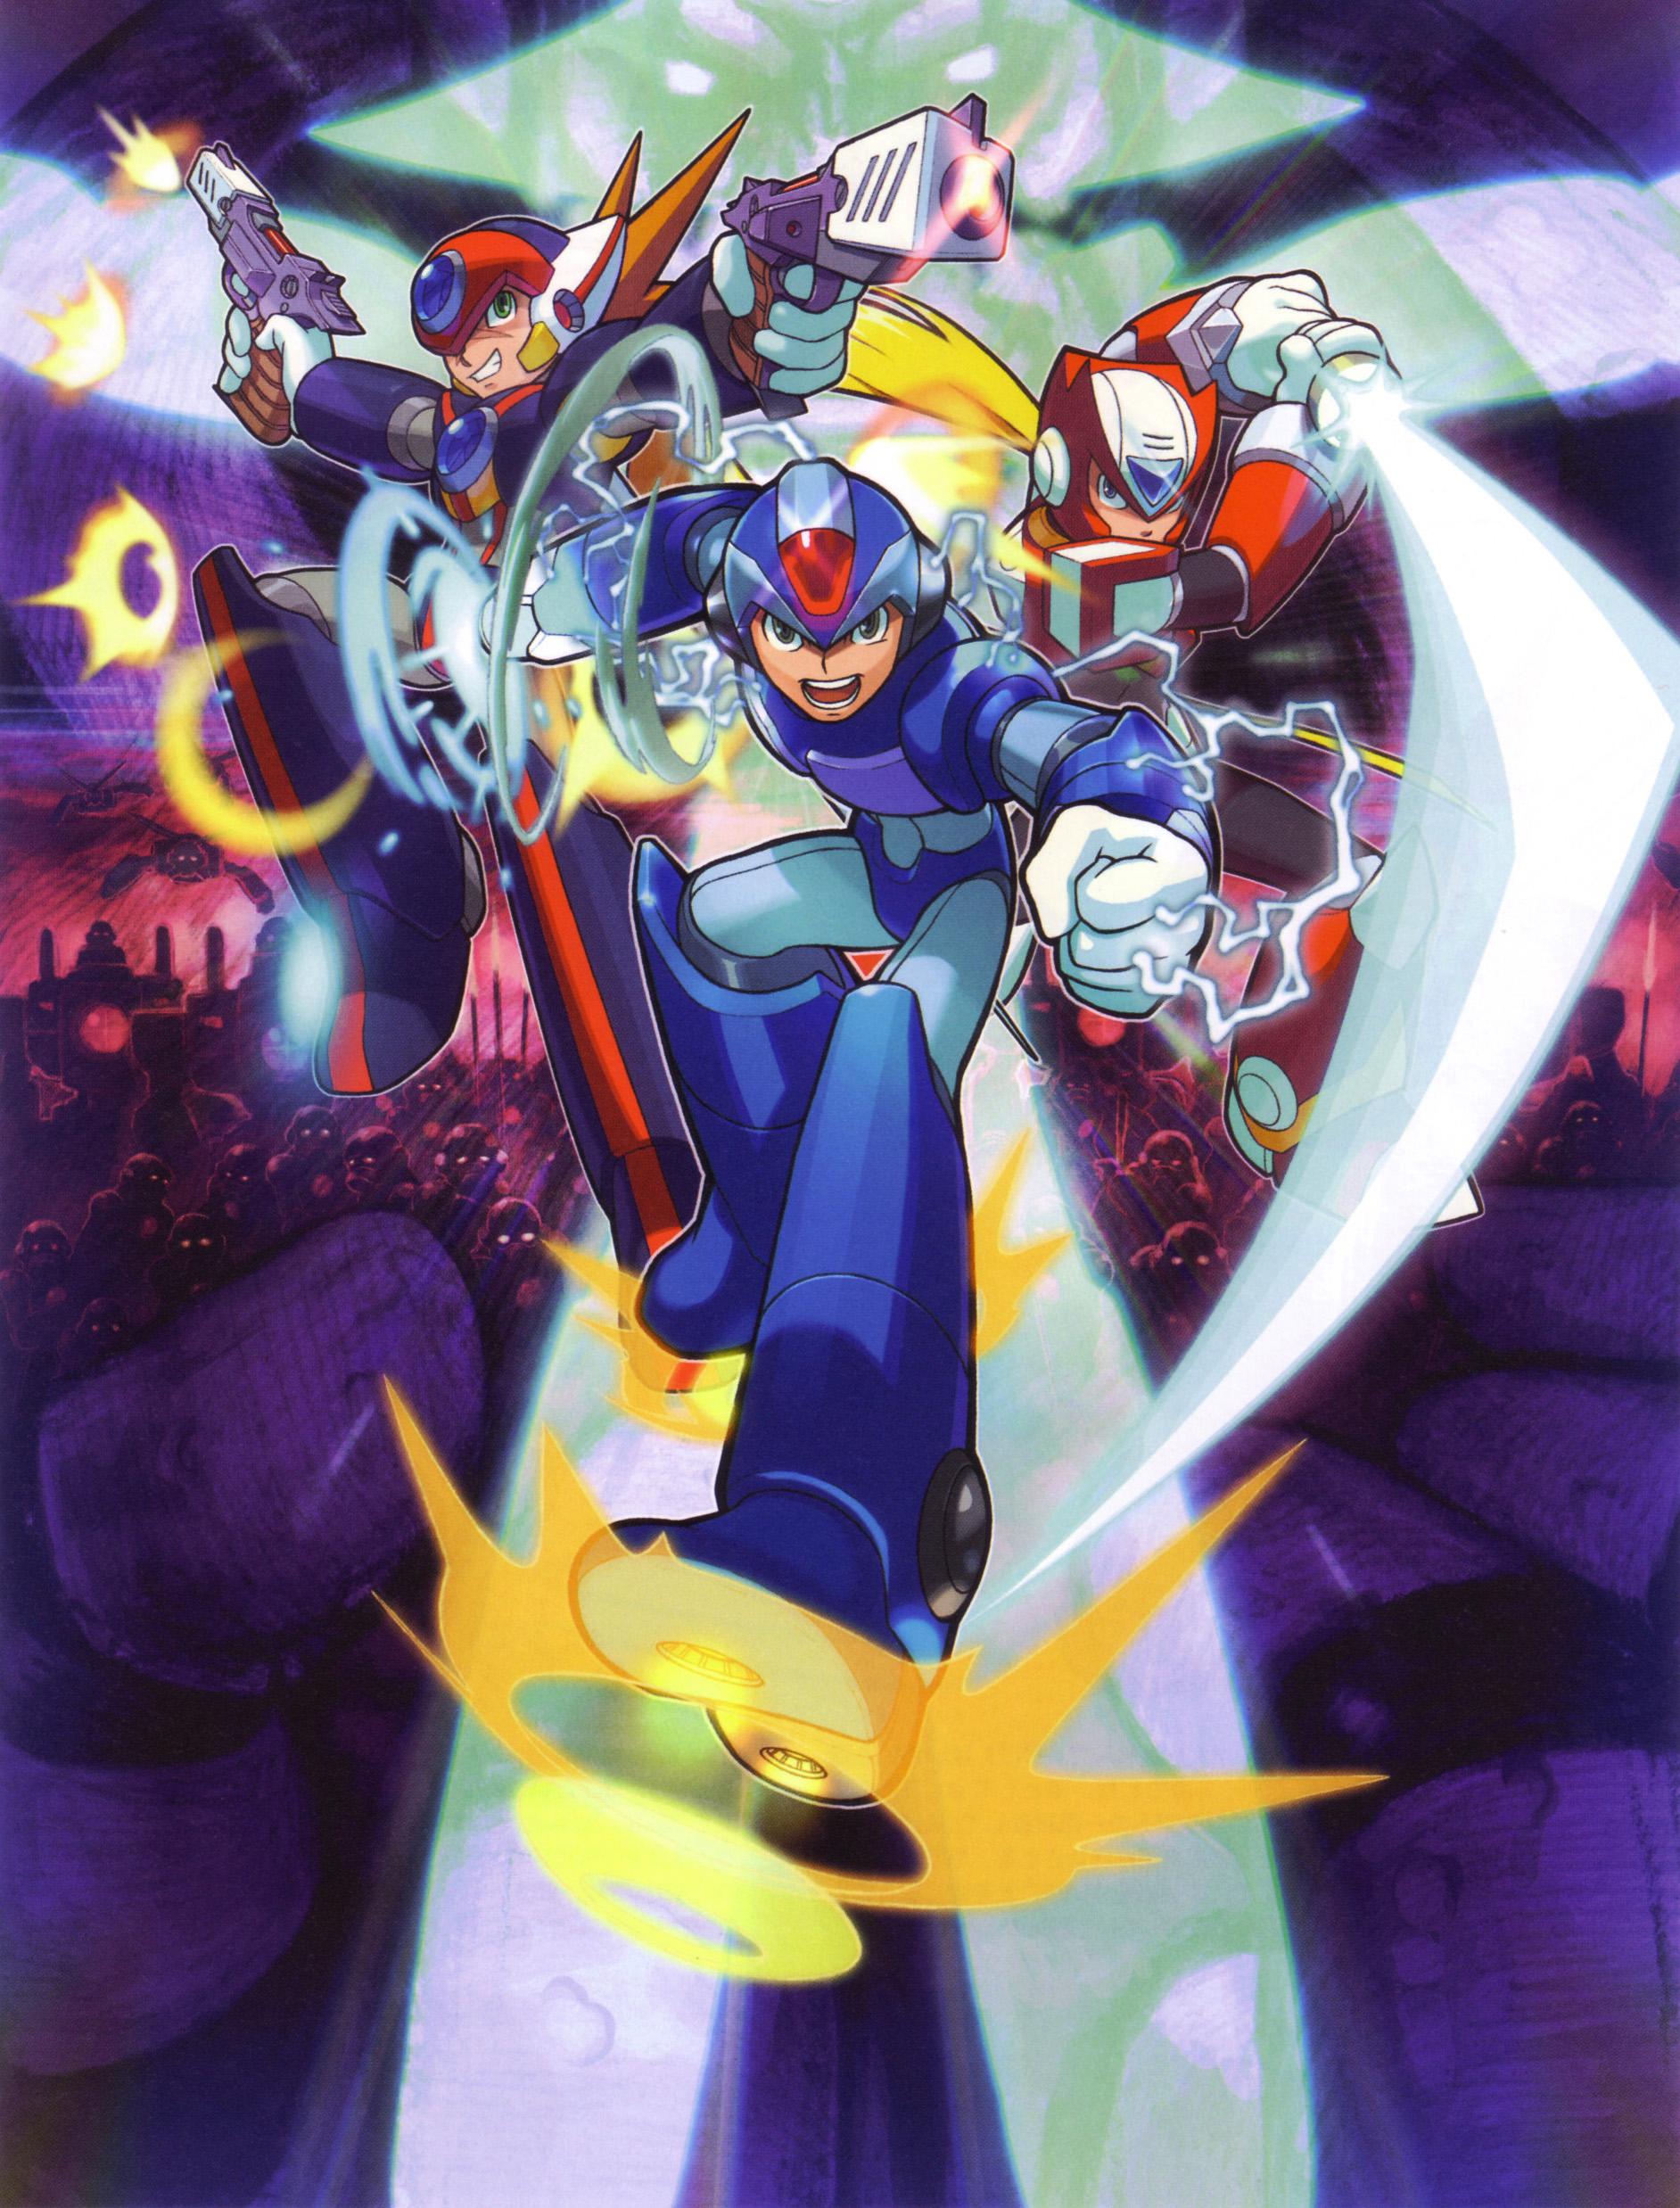 Mega man x8 mmkb fandom powered by wikia - Megaman wikia ...